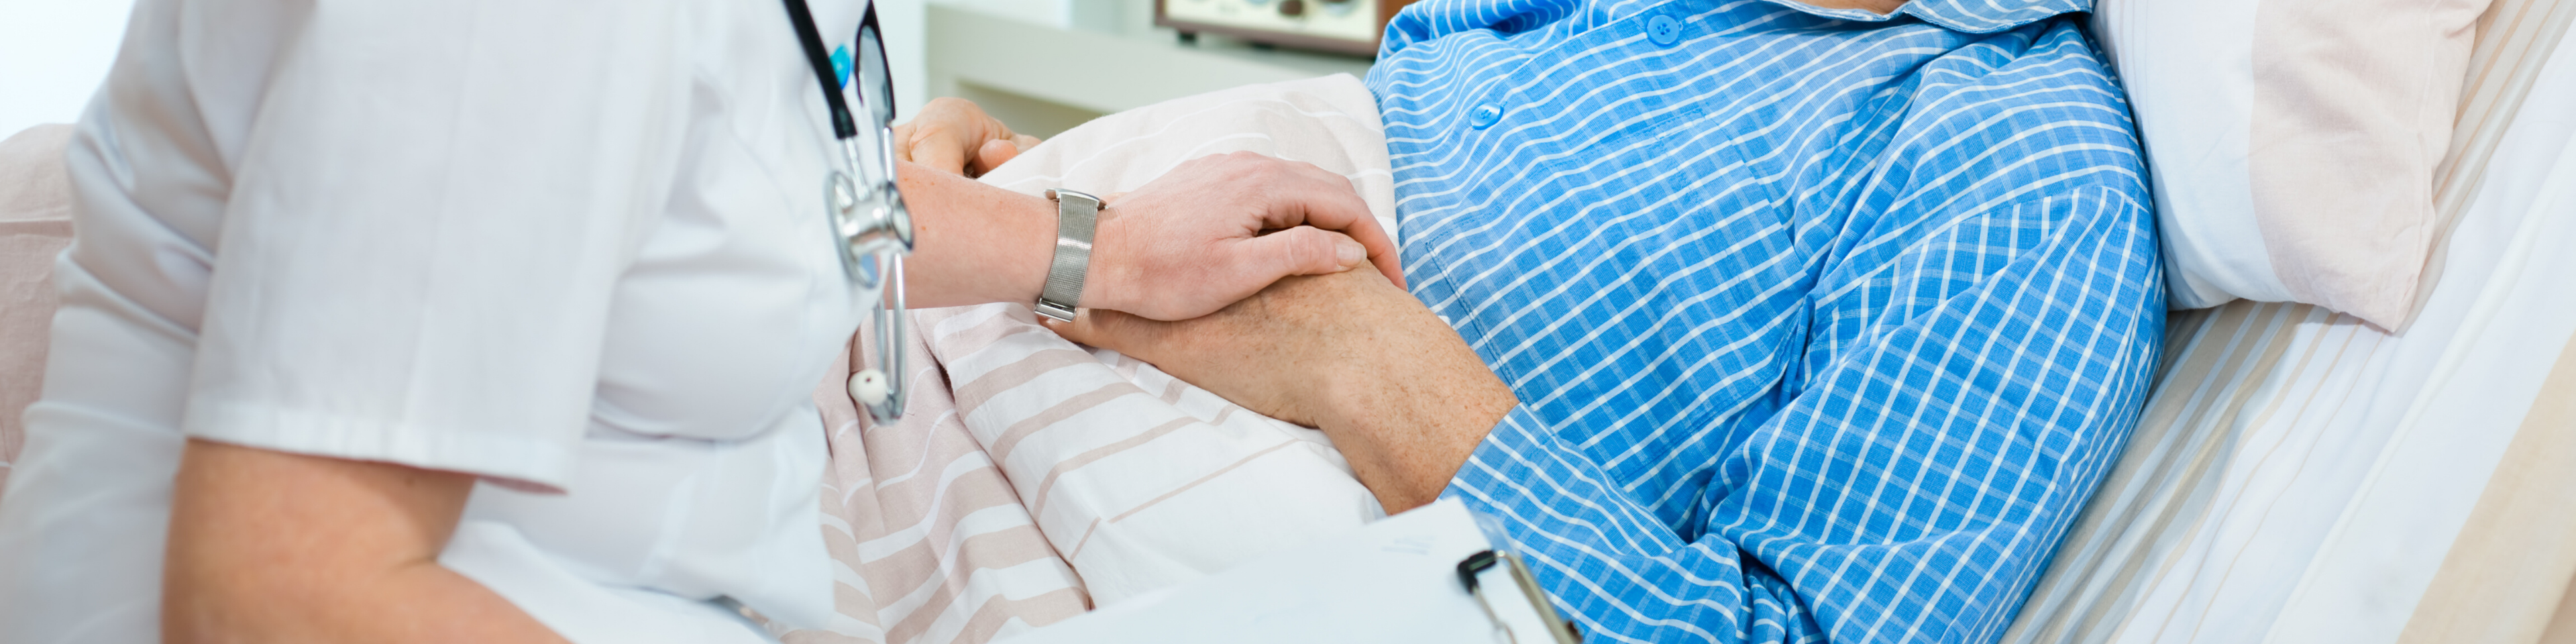 Managing sepsis care and antimicrobial stewardship — a balancing act